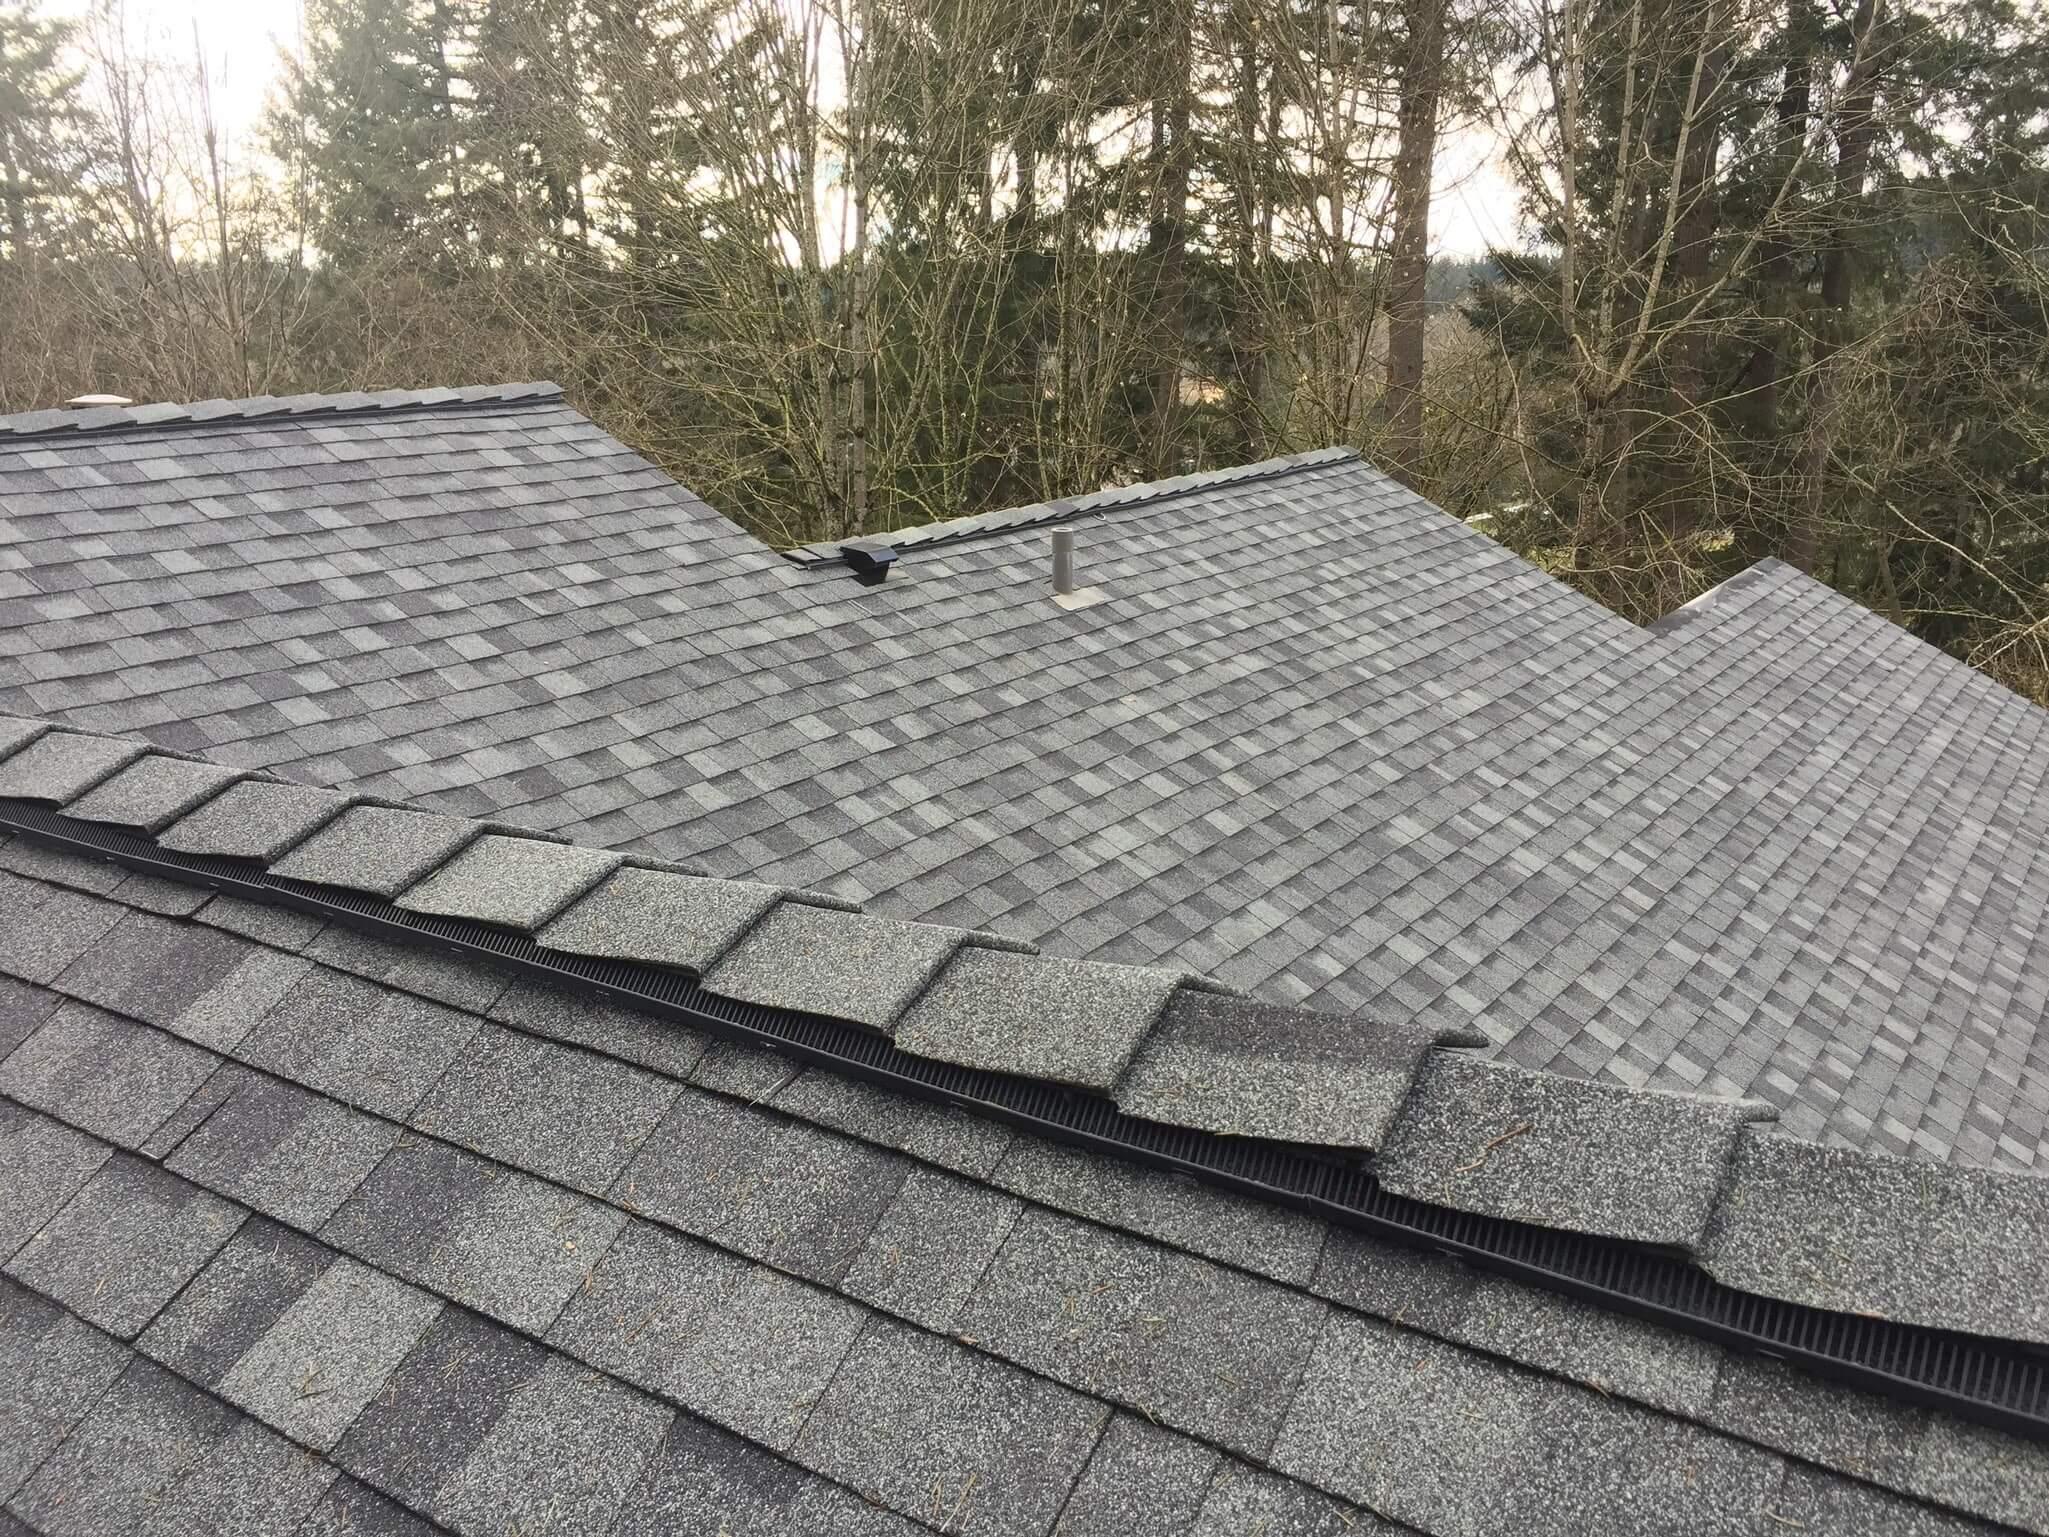 Asphalt Shingle Amp Composition Roof Replacement